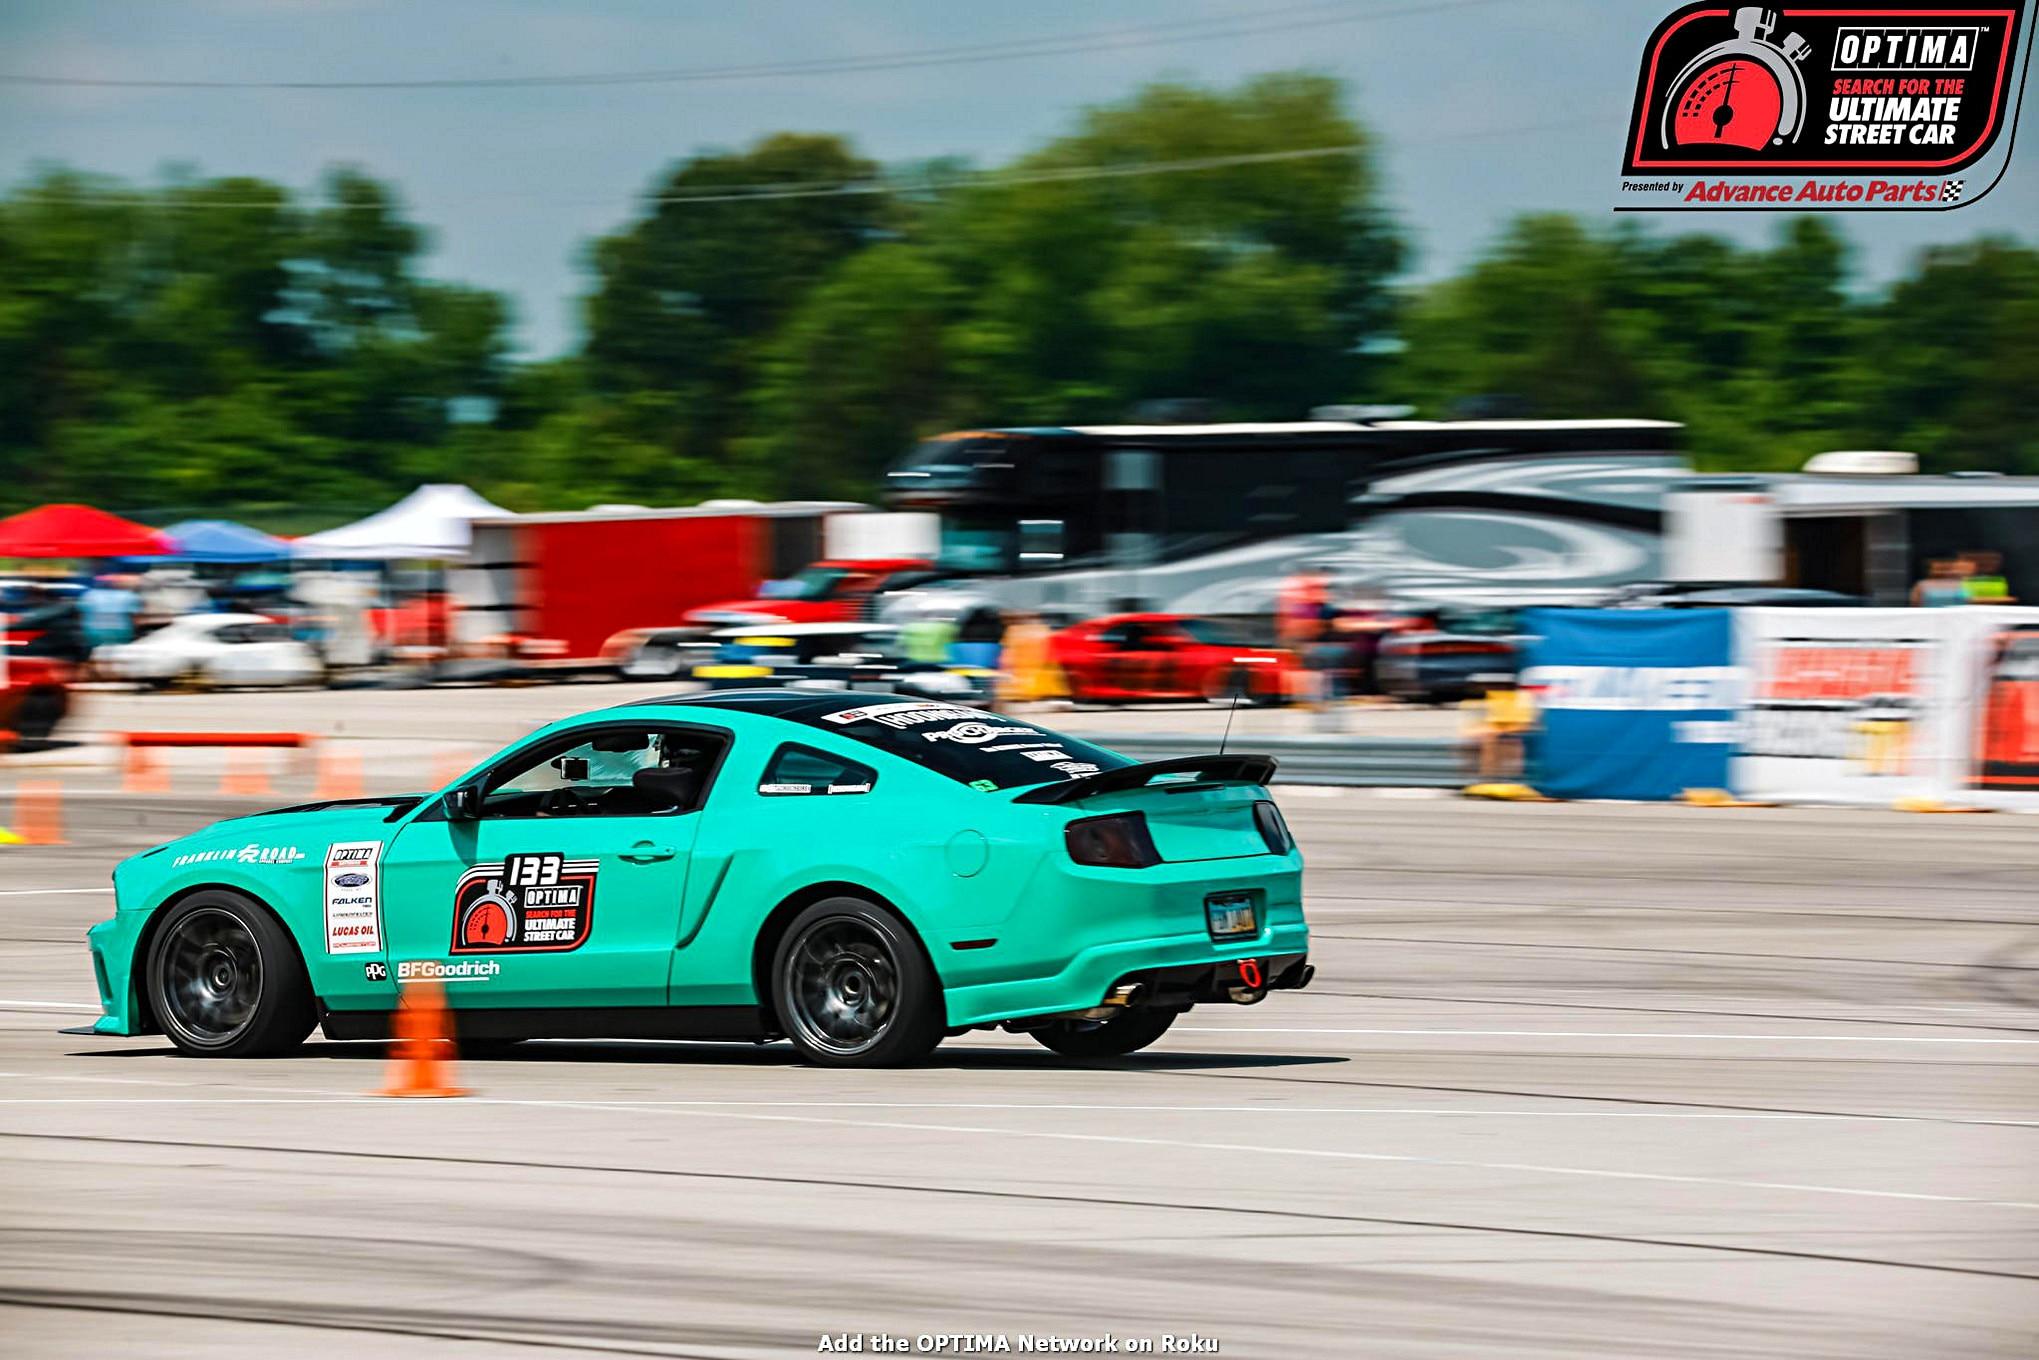 MMFF Tim Schoch 2011 Ford Mustang DriveOPTIMA NCM Motorsports Park 2018 682 014